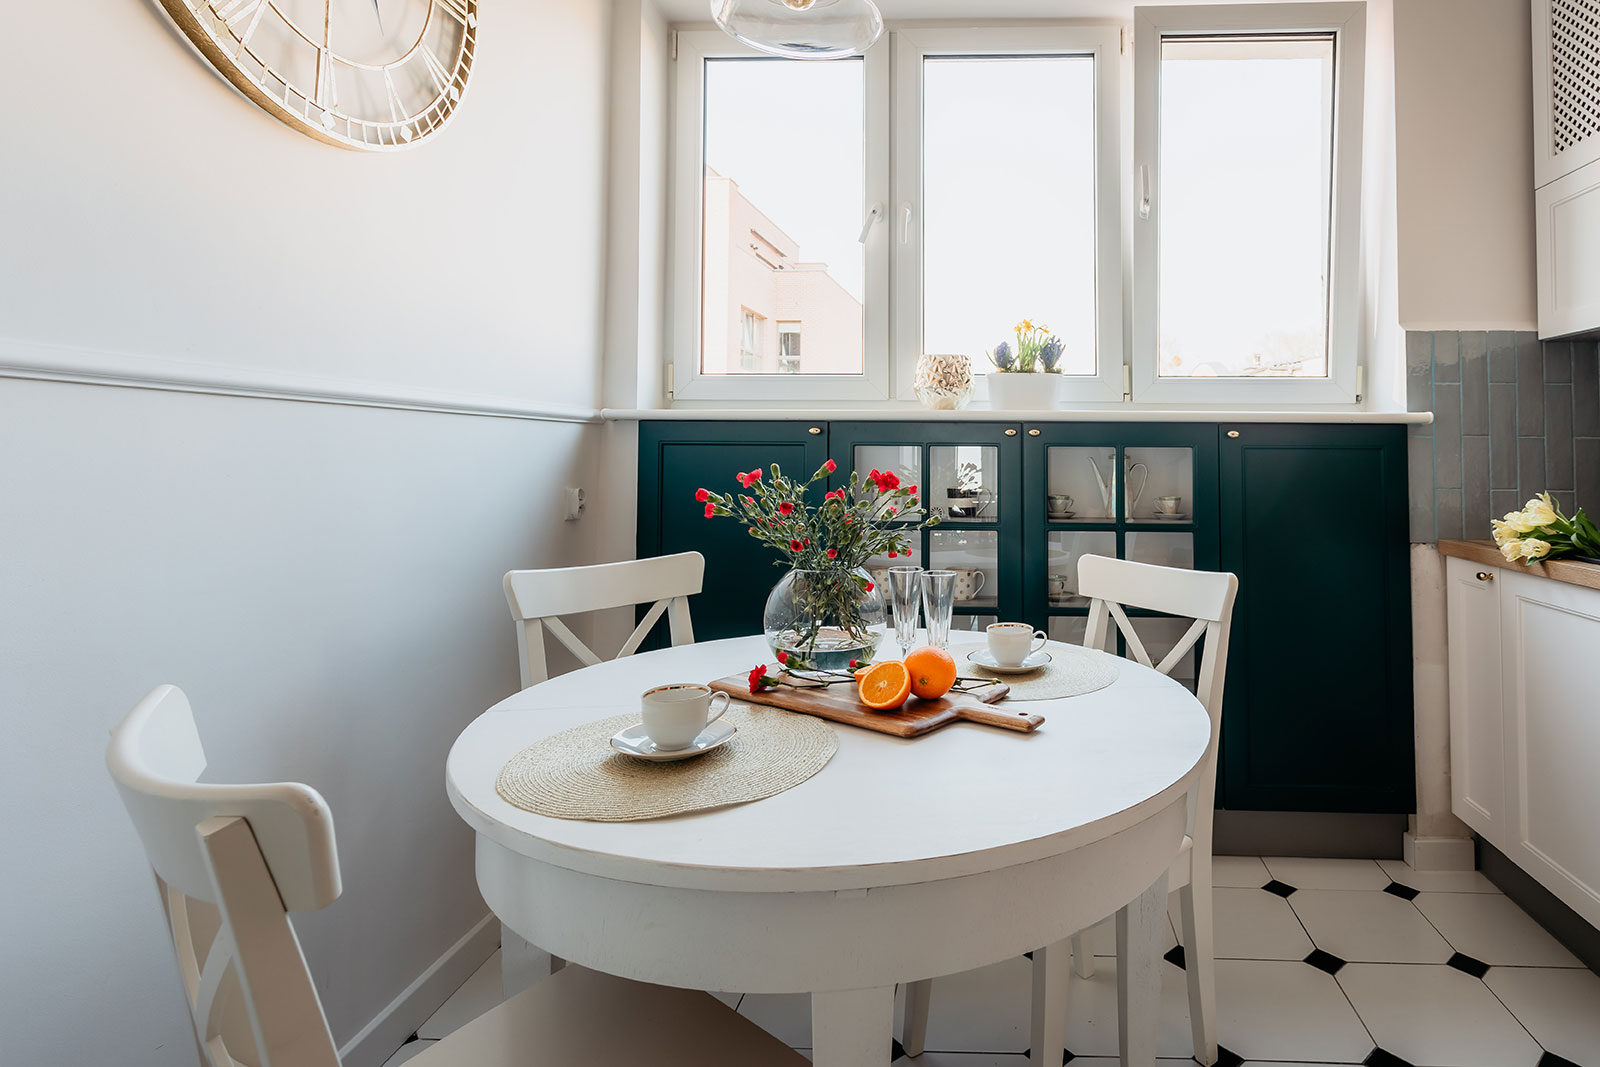 Kuchnia inspirowana stylem Hampton